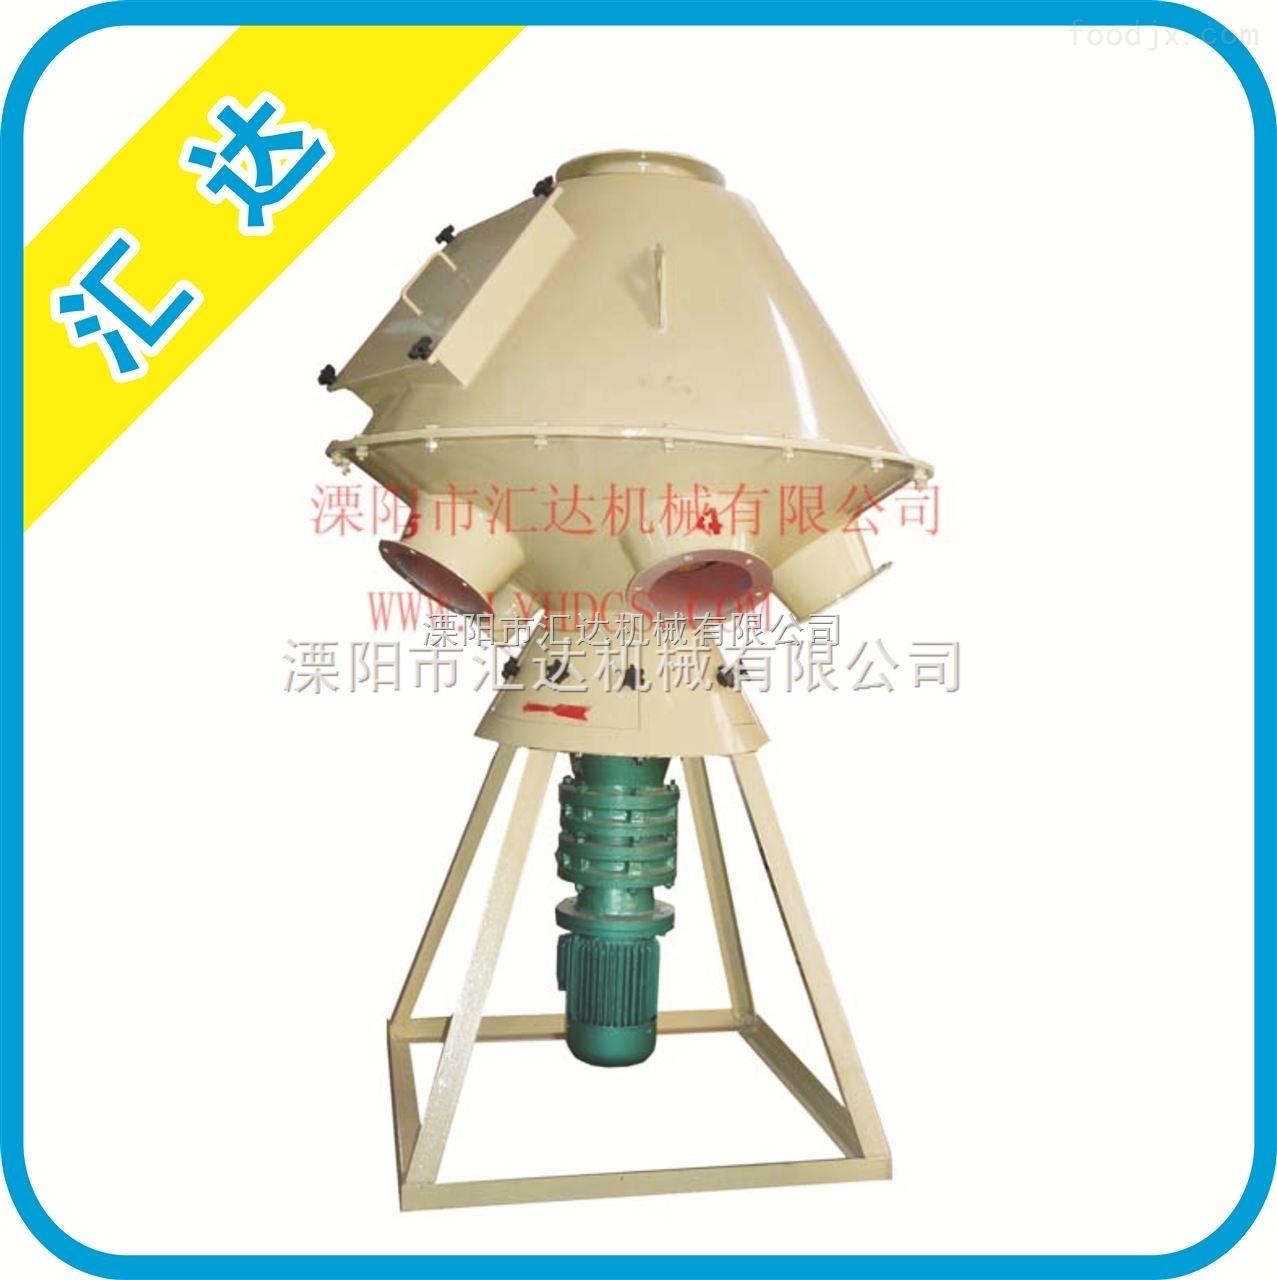 tfpx系列旋转分配器_中国食品机械设备网